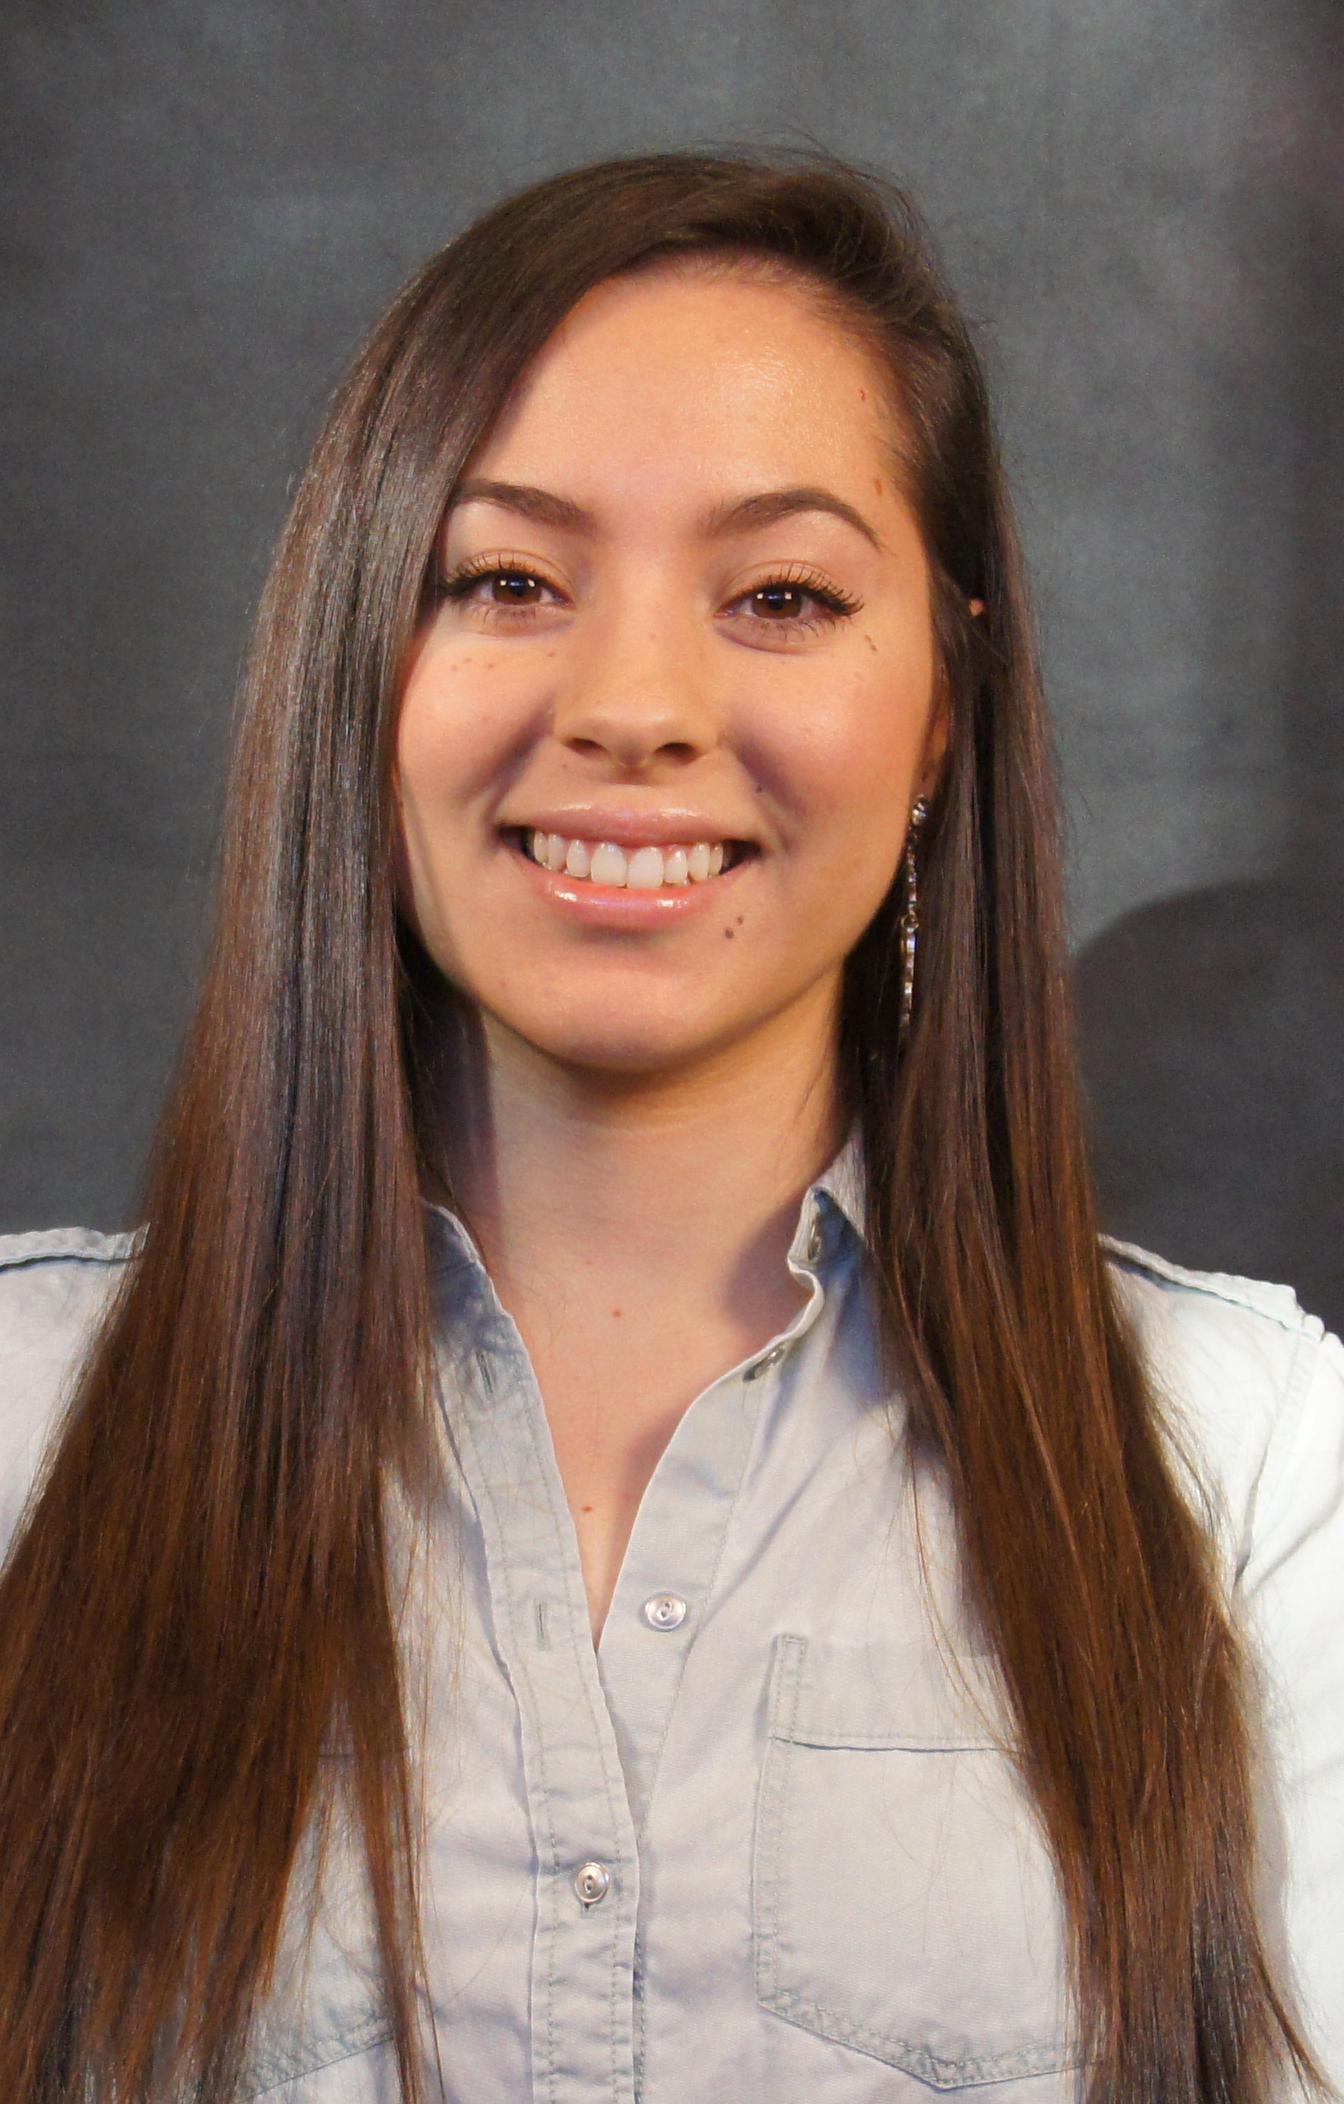 Elizabeth Vega-Orozco  ChemicalEngineering, Senior North Carolina A&T State University   James & Dianne Iseman Scholarship